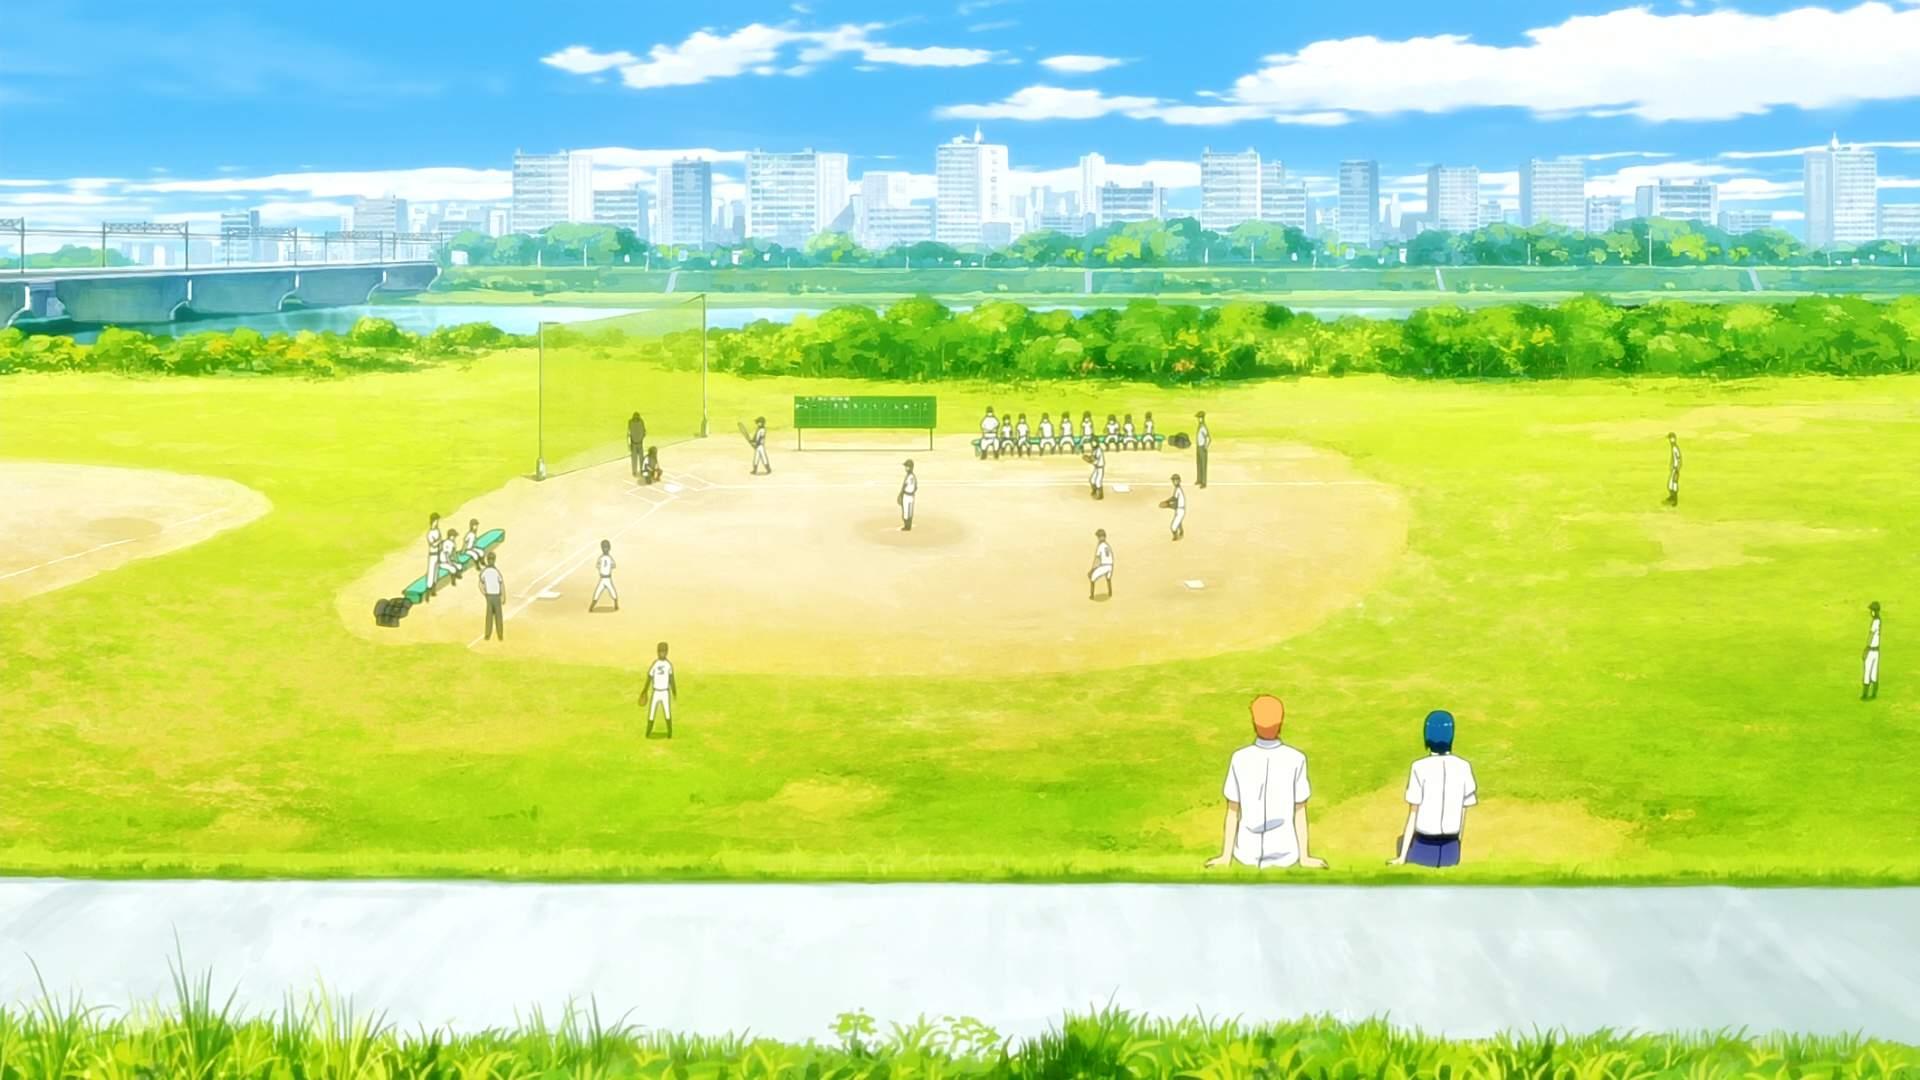 TokyoGhoul-OVA1-SS6-O Tokyo Ghoul OVA 1 Review